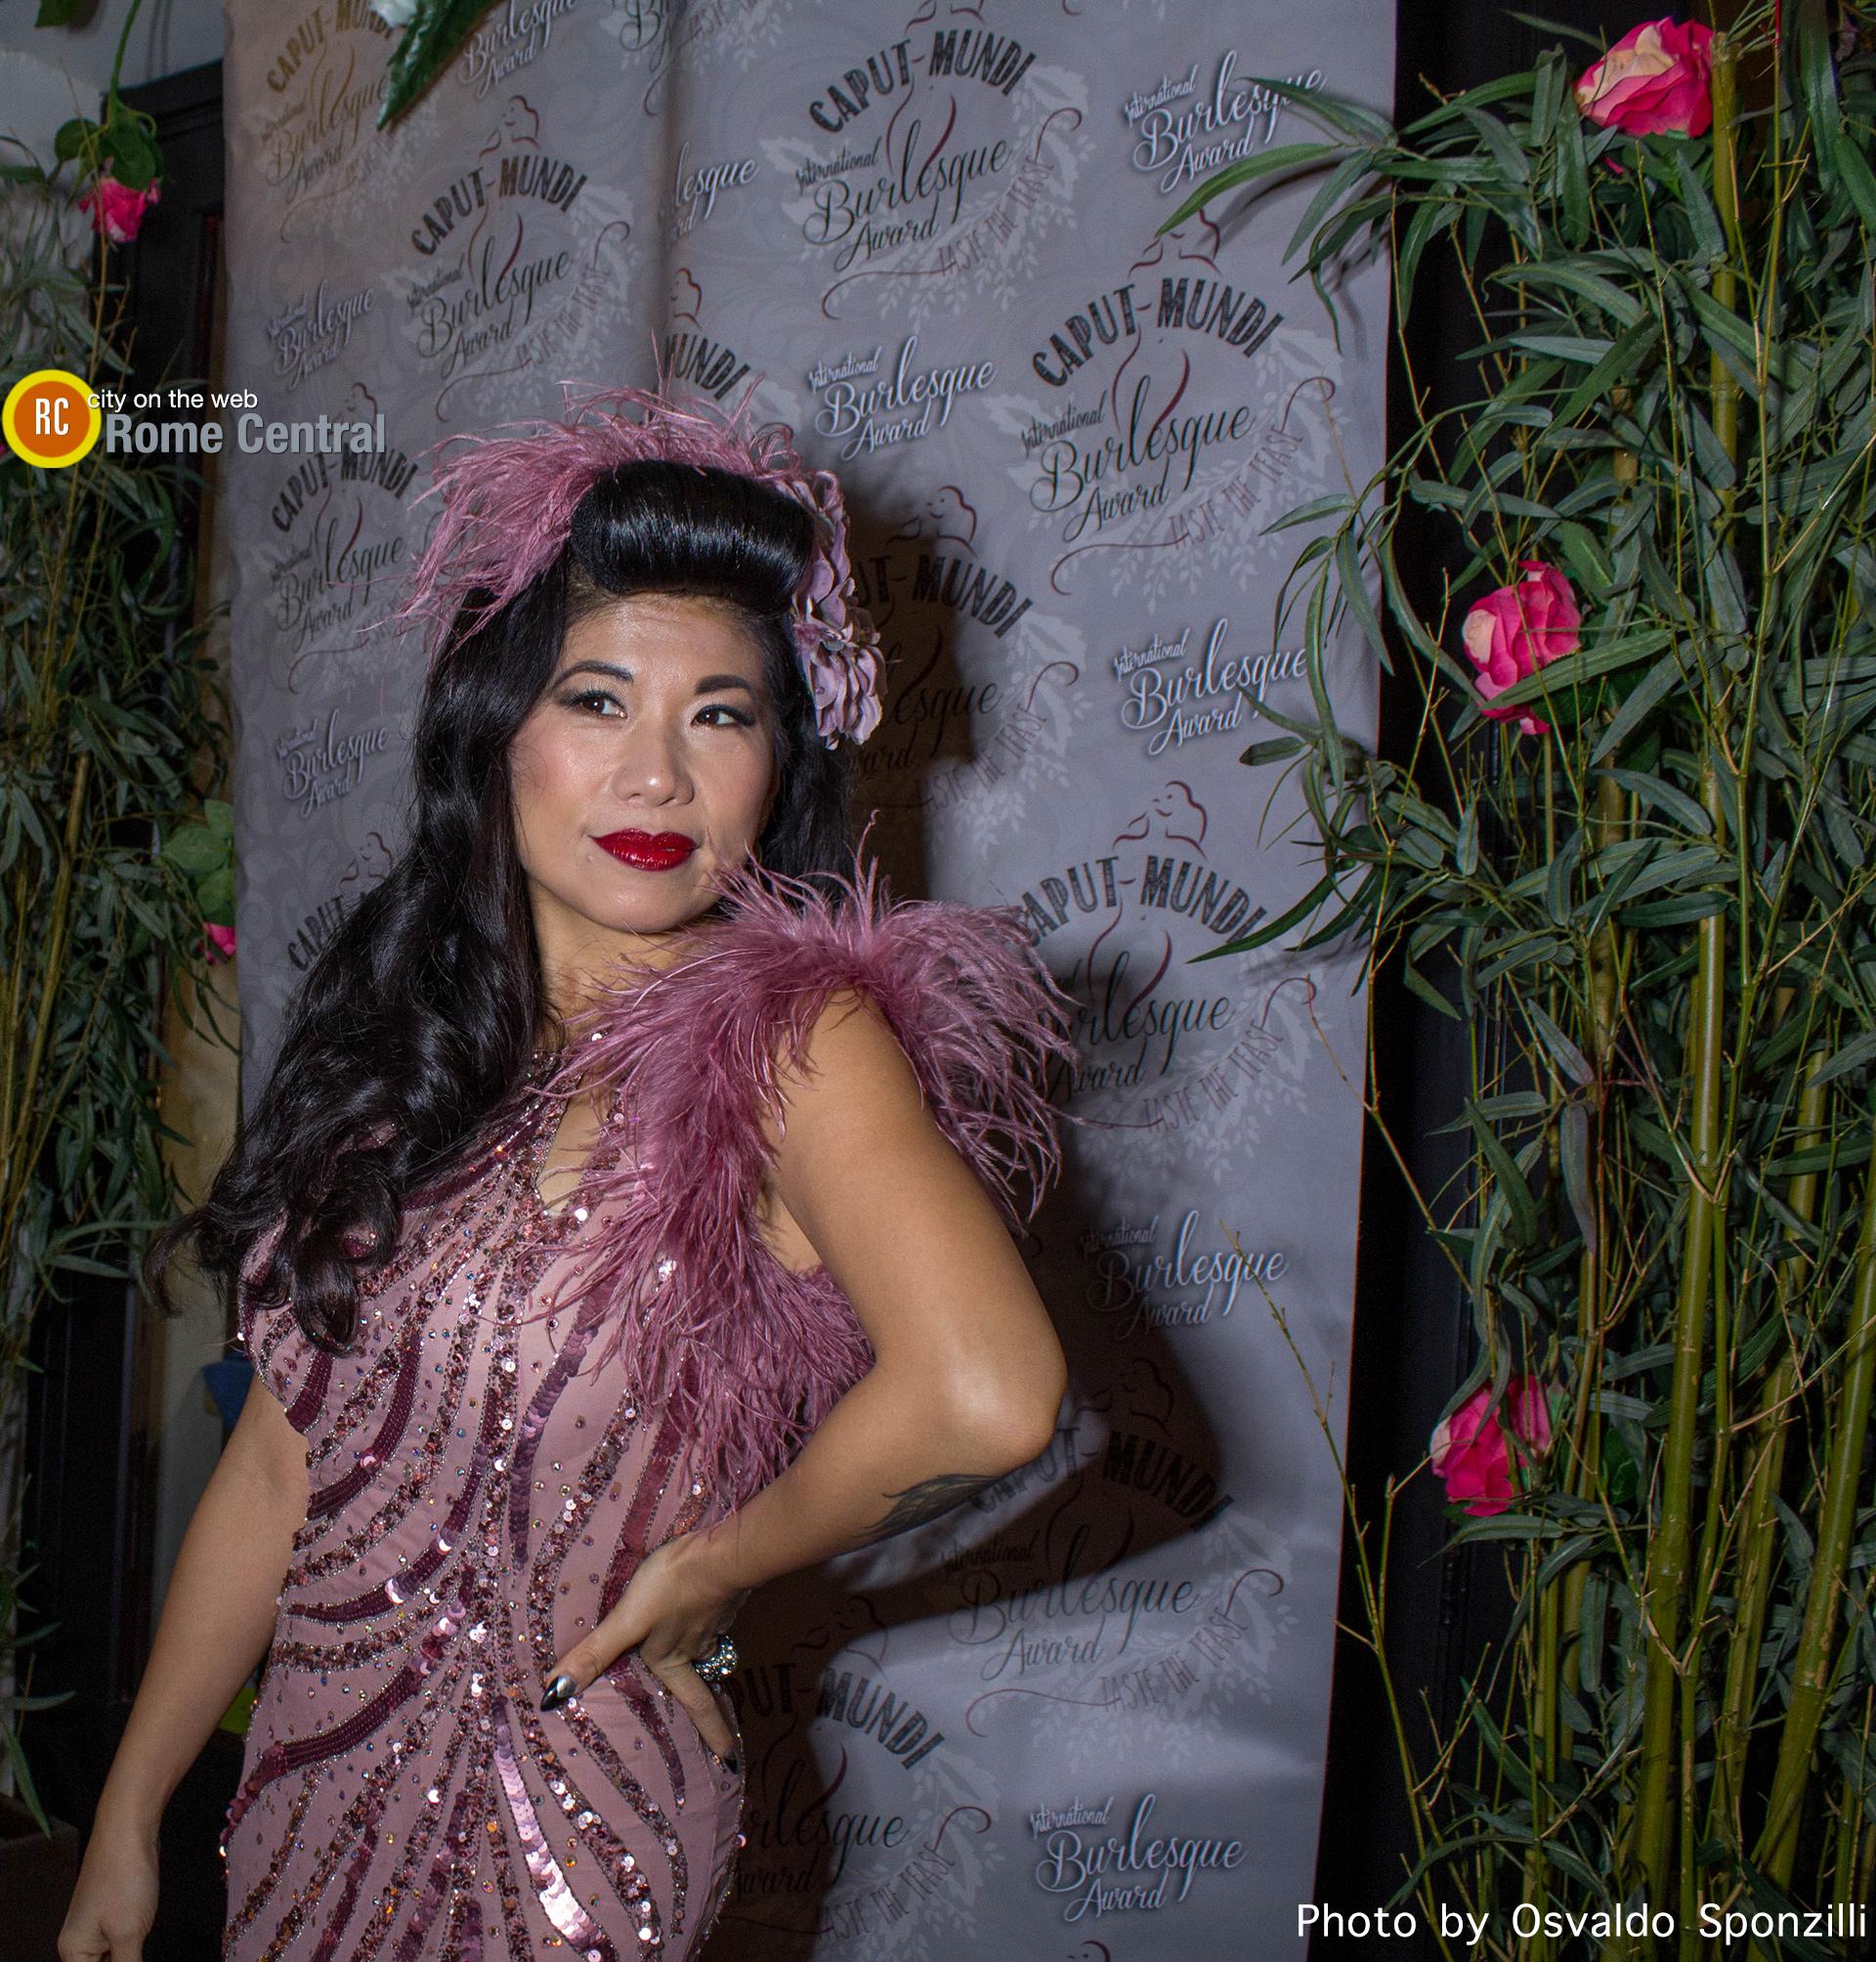 burlesque_foto_sponzilli-teatro-centrale-roma-2015-21